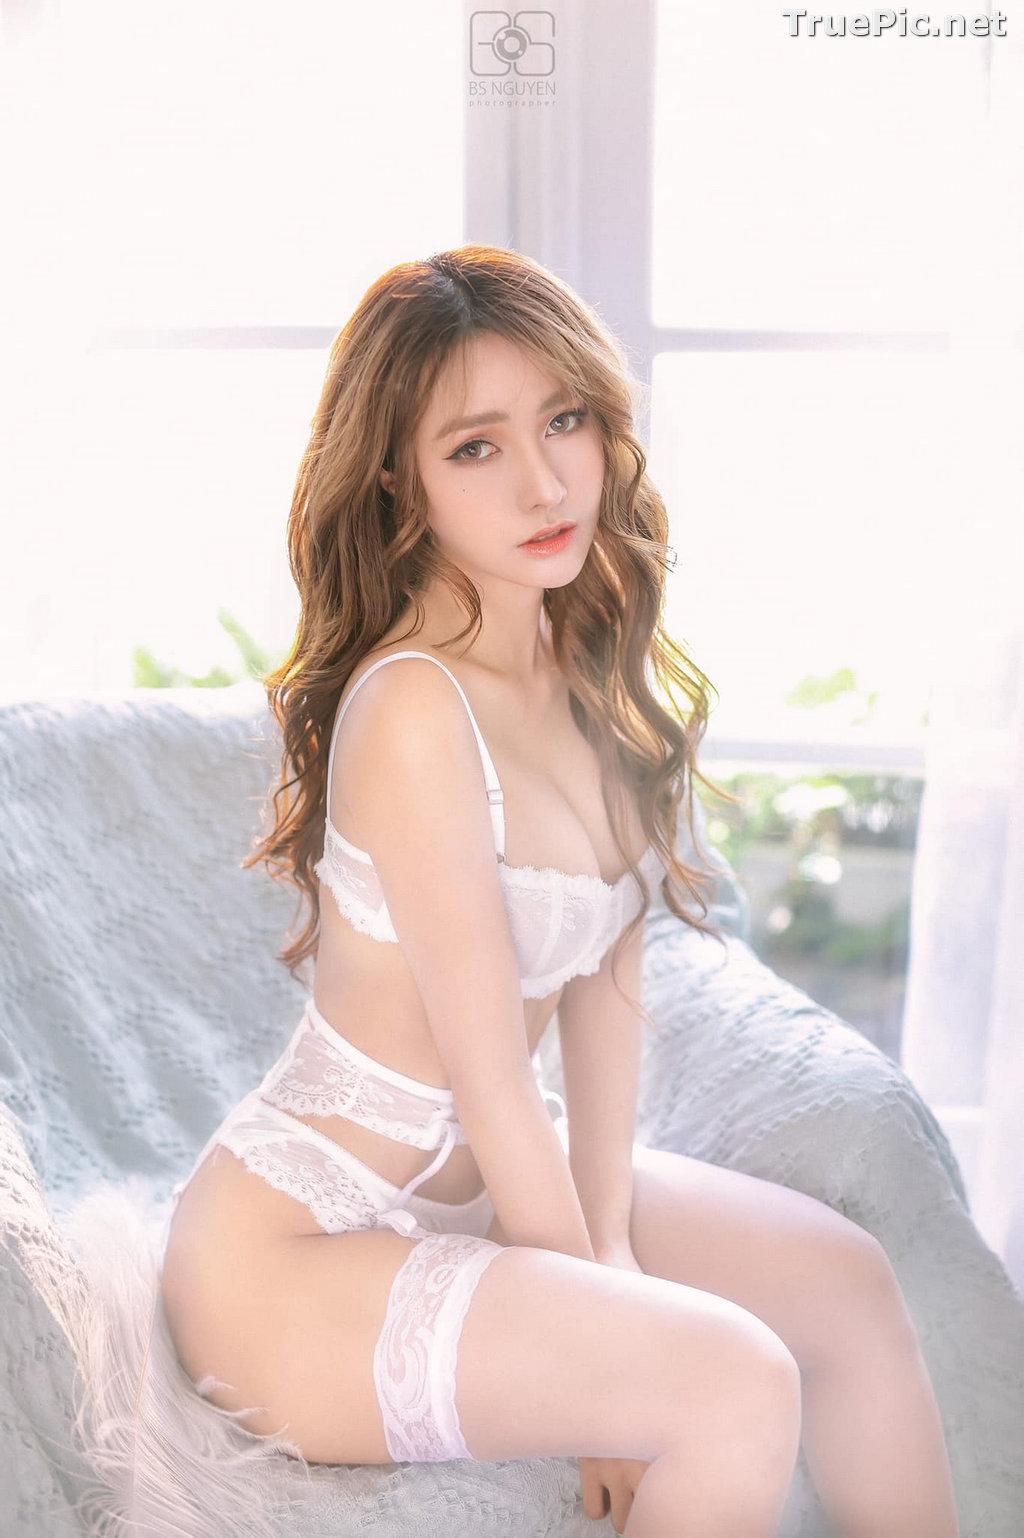 Image Vietnamese Model - Nguyen Thi Phi Yen - Beautiful Sexy White Lingerie - TruePic.net - Picture-12